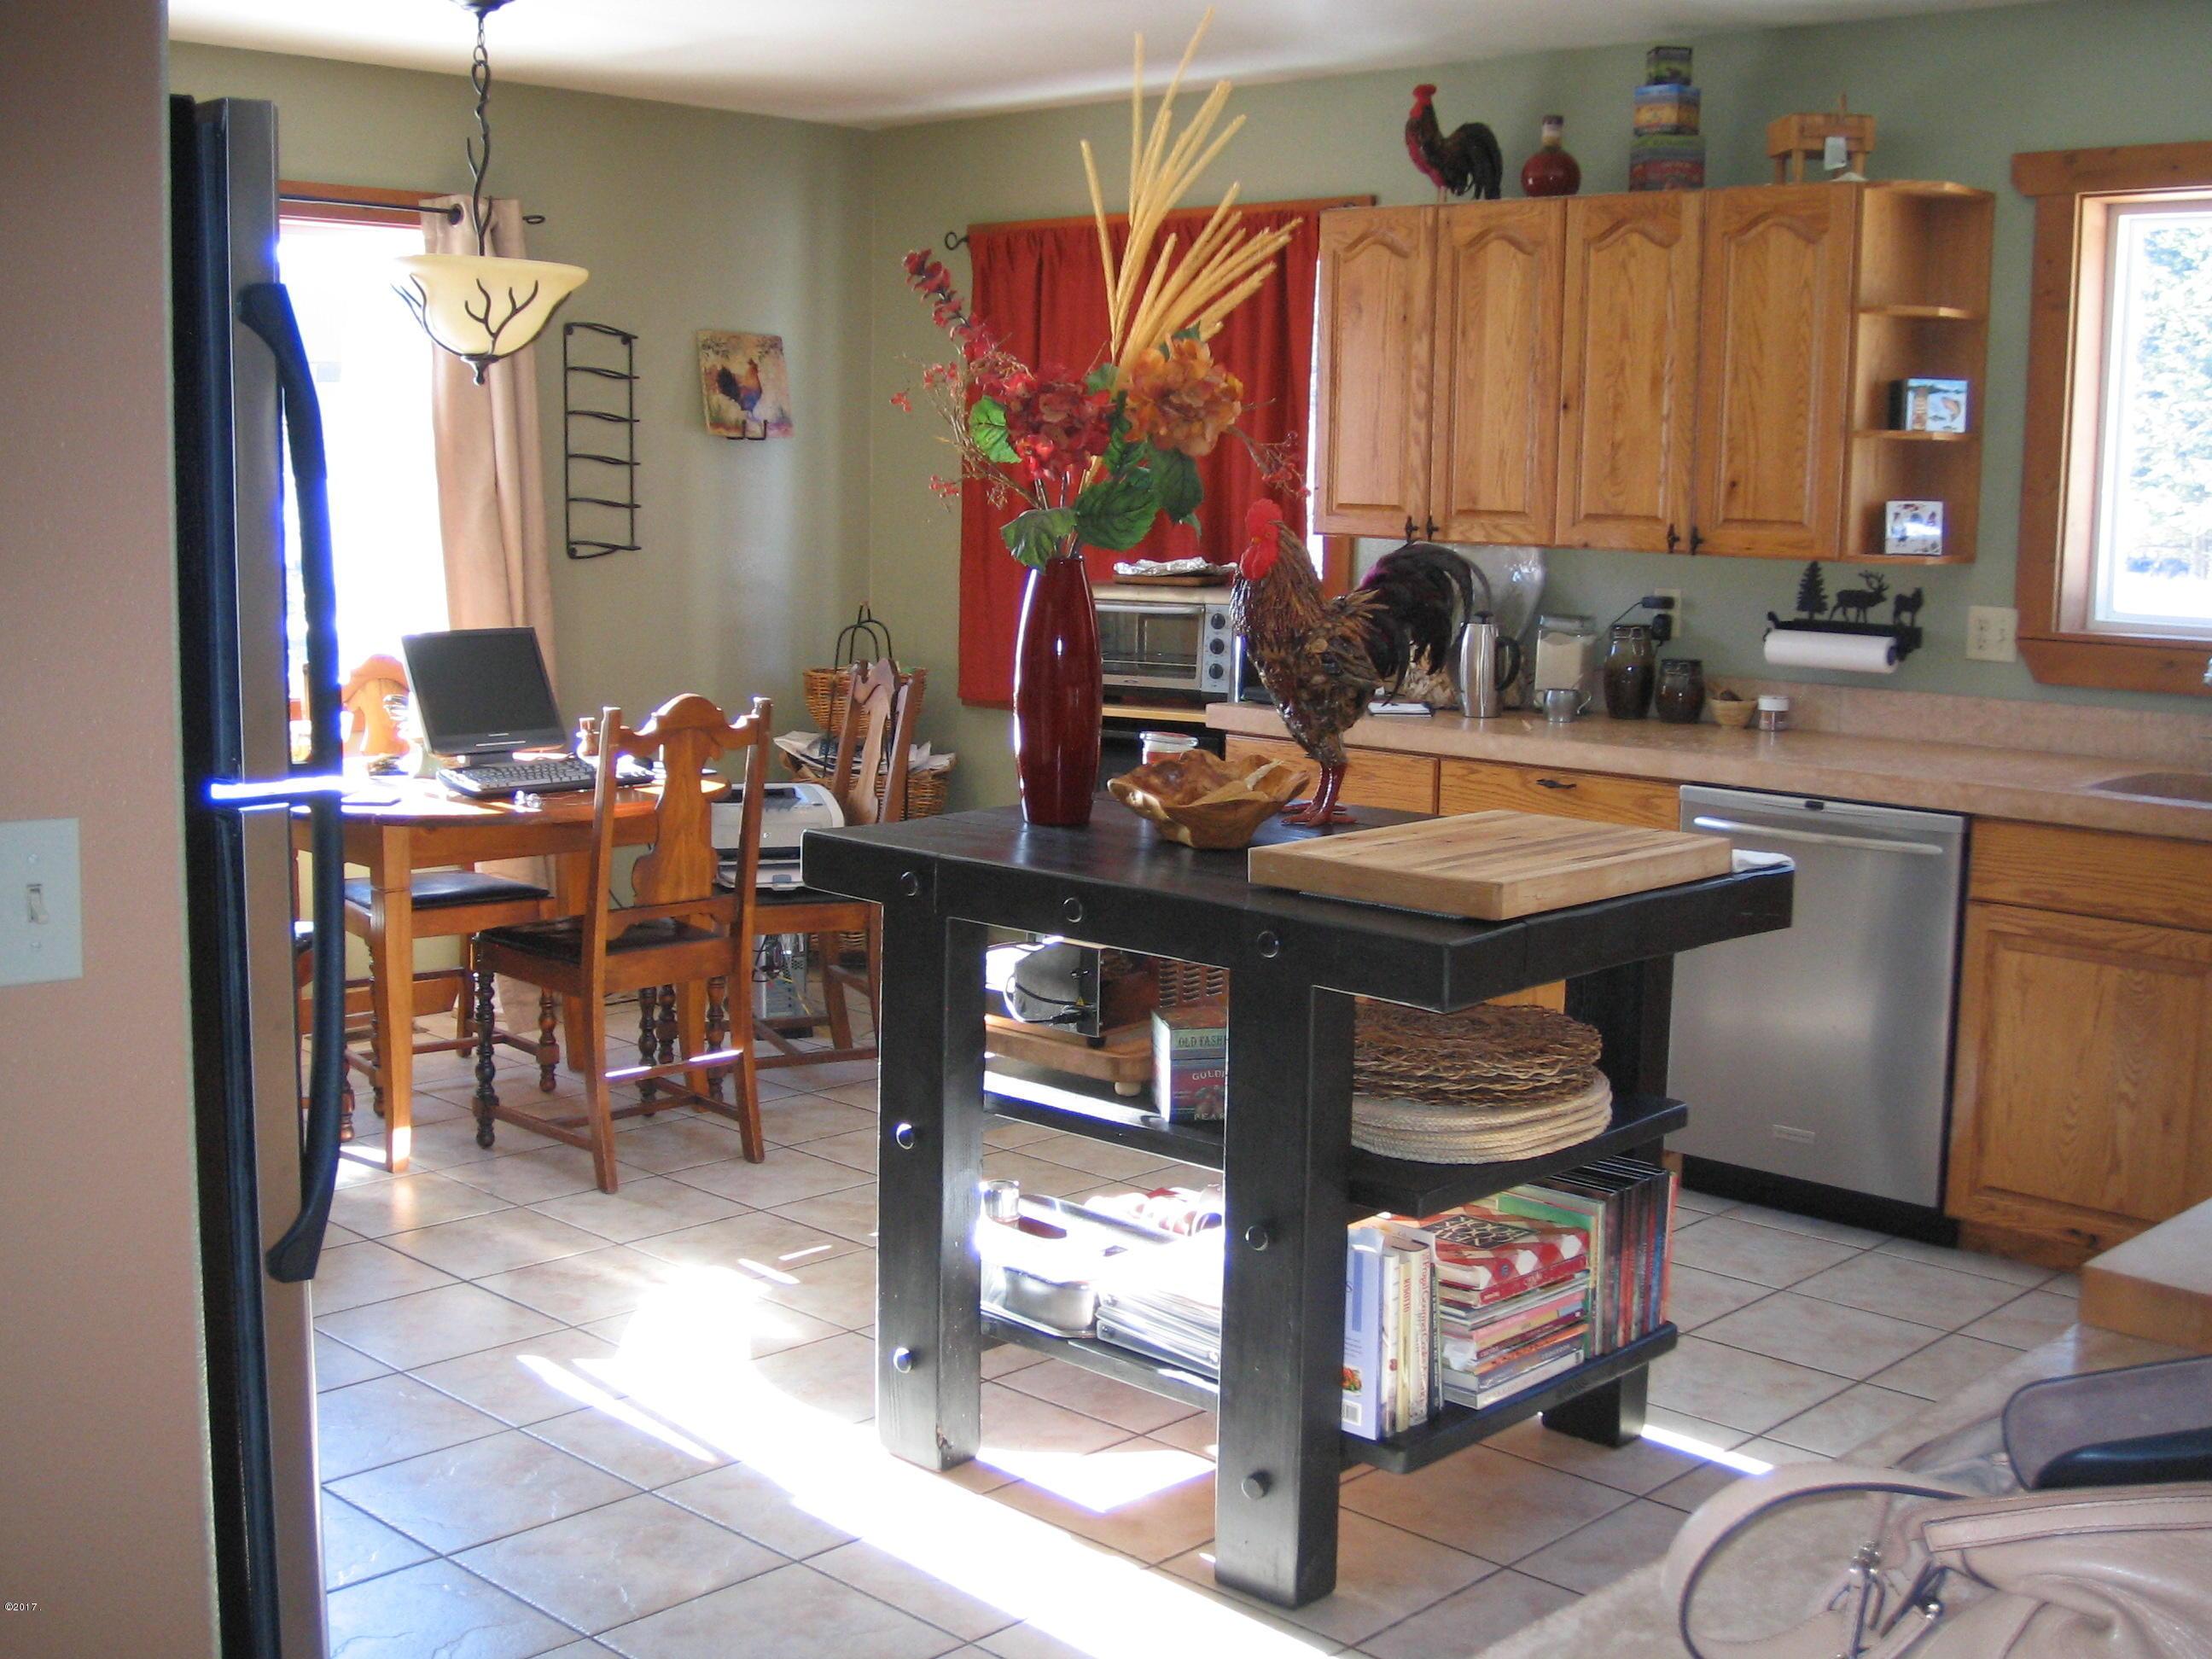 Additional photo for property listing at 110 Sandy Lane  Bigfork, Montana 59911 United States